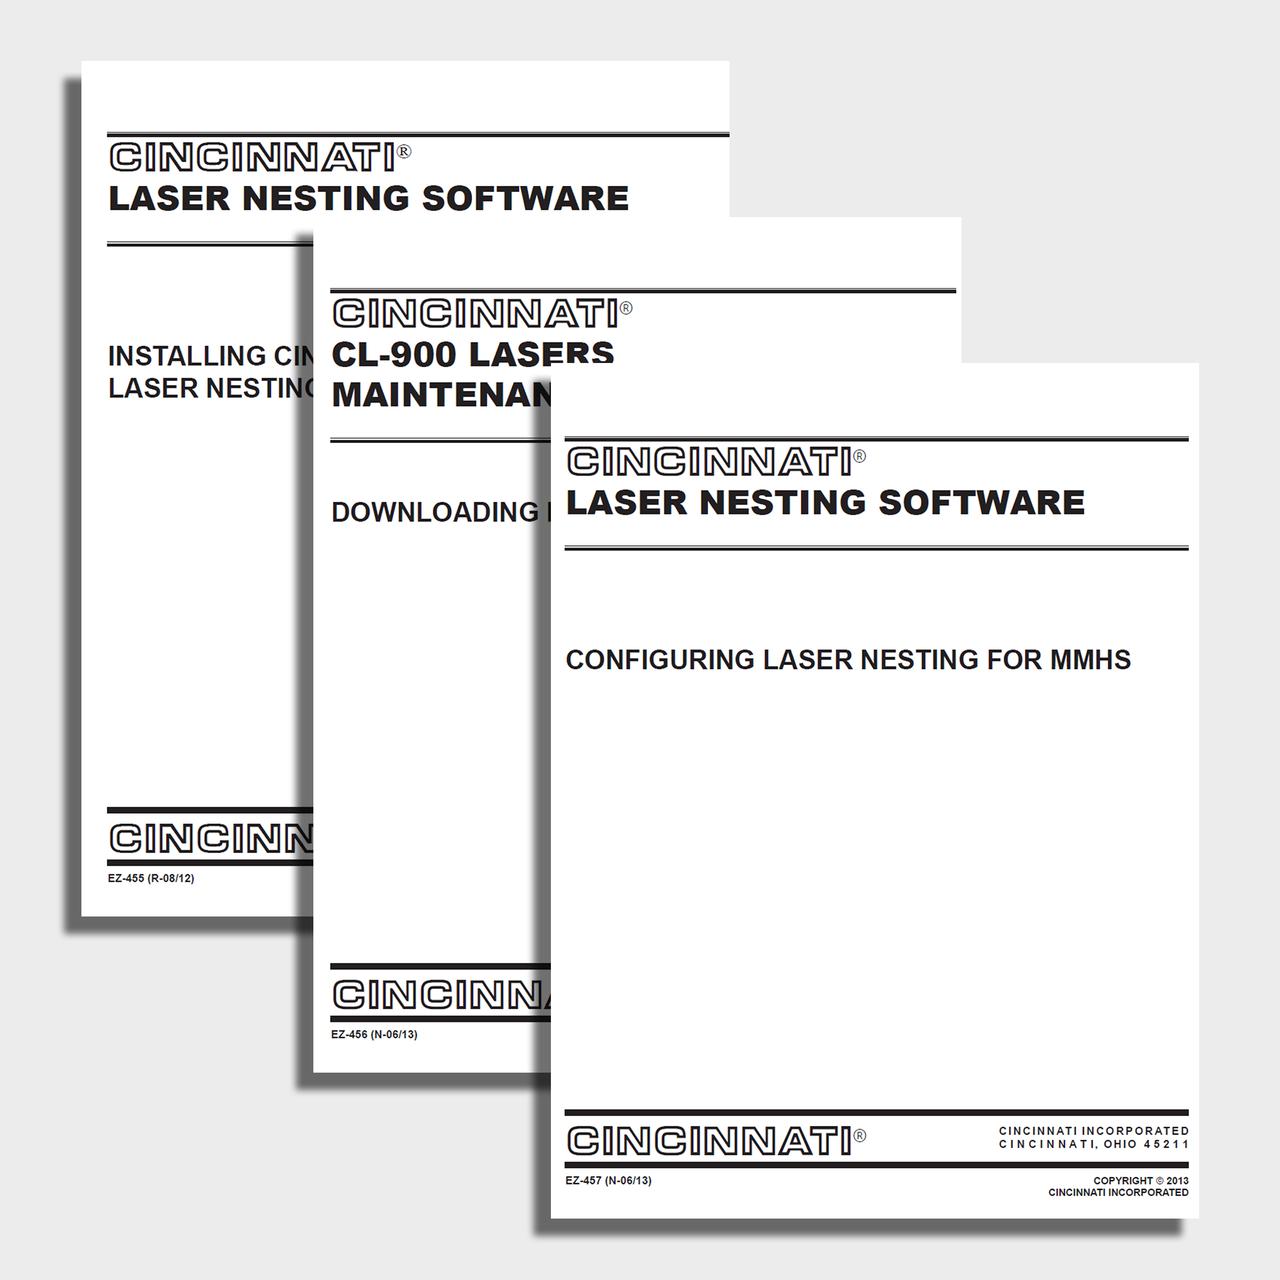 Laser Nesting Software Manual - Cincinnati Incorporated